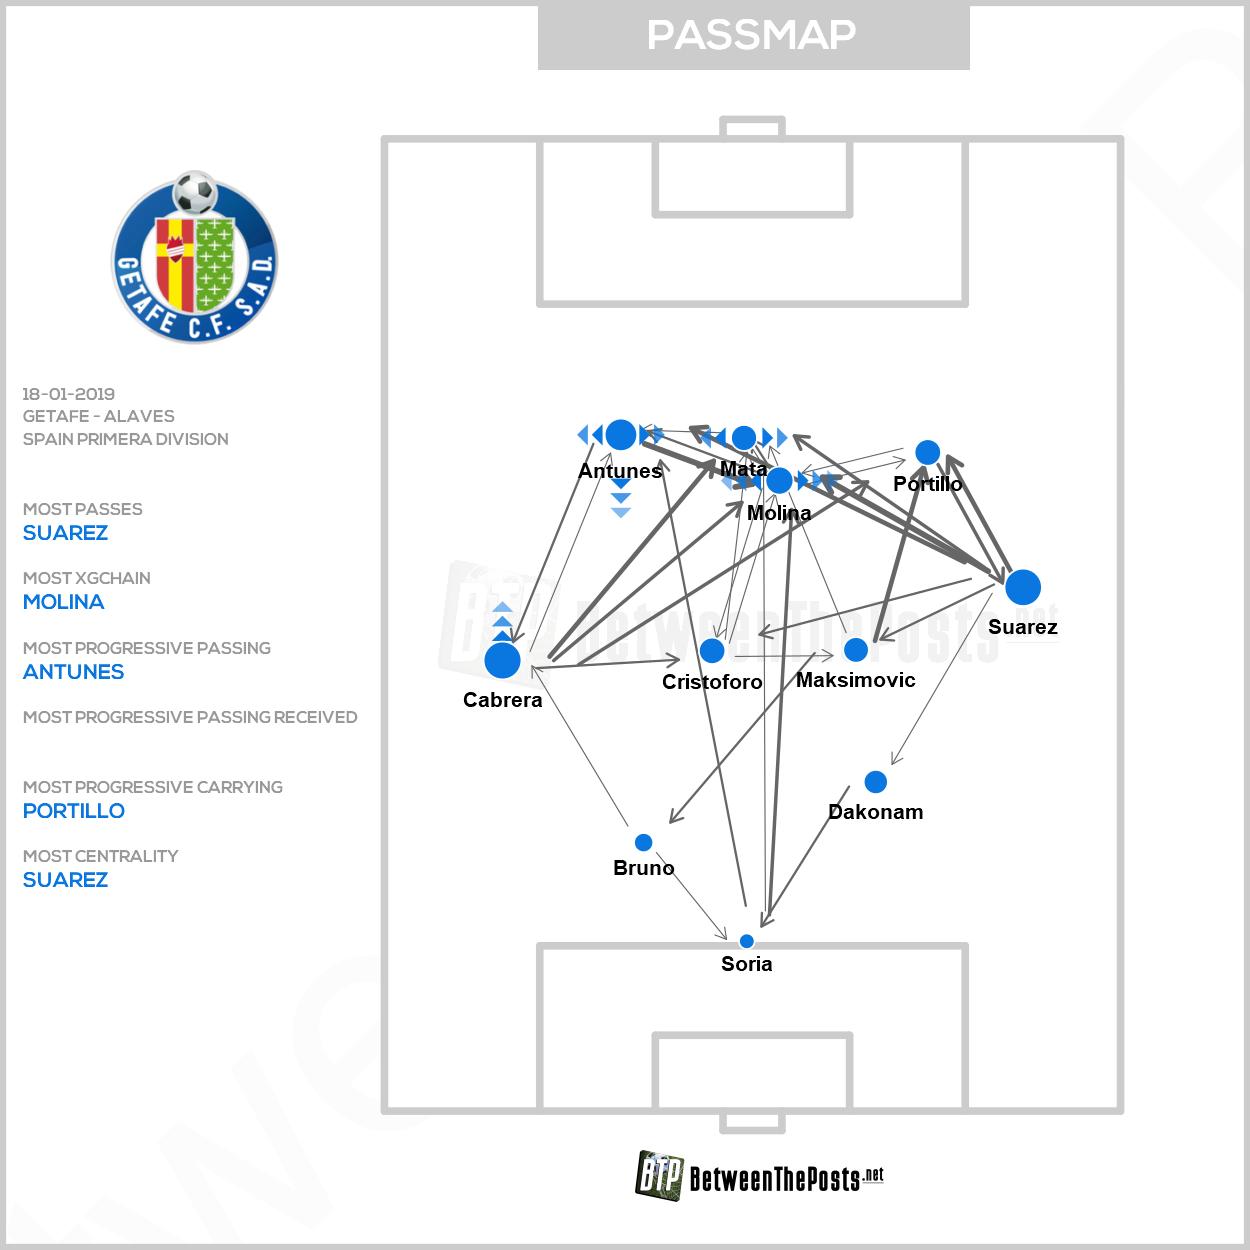 Passmap Getafe